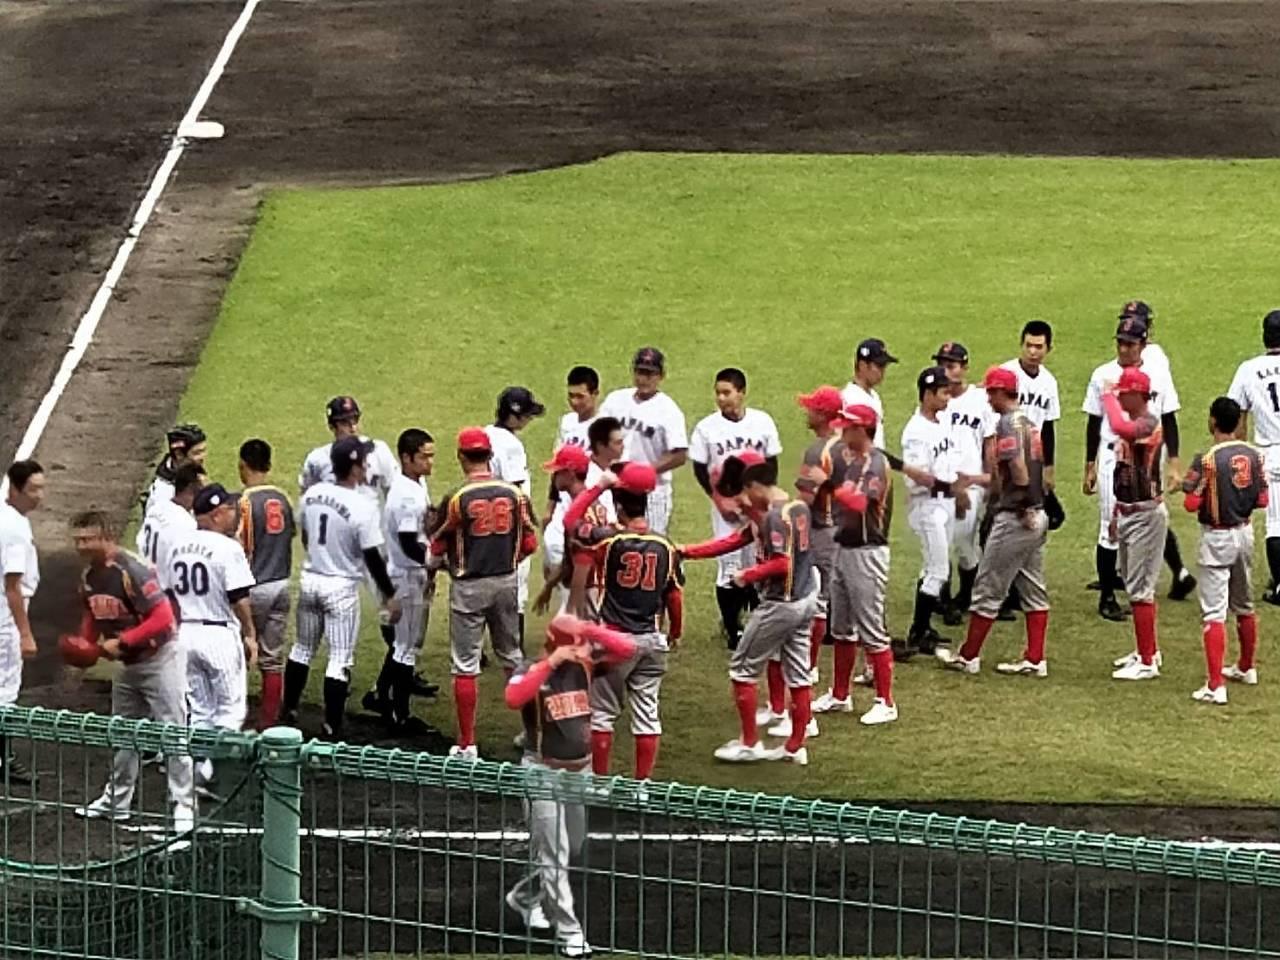 U18亞青賽季軍戰,日本隊以14:1擊敗大陸隊。特派記者婁靖平/日本宮崎攝影